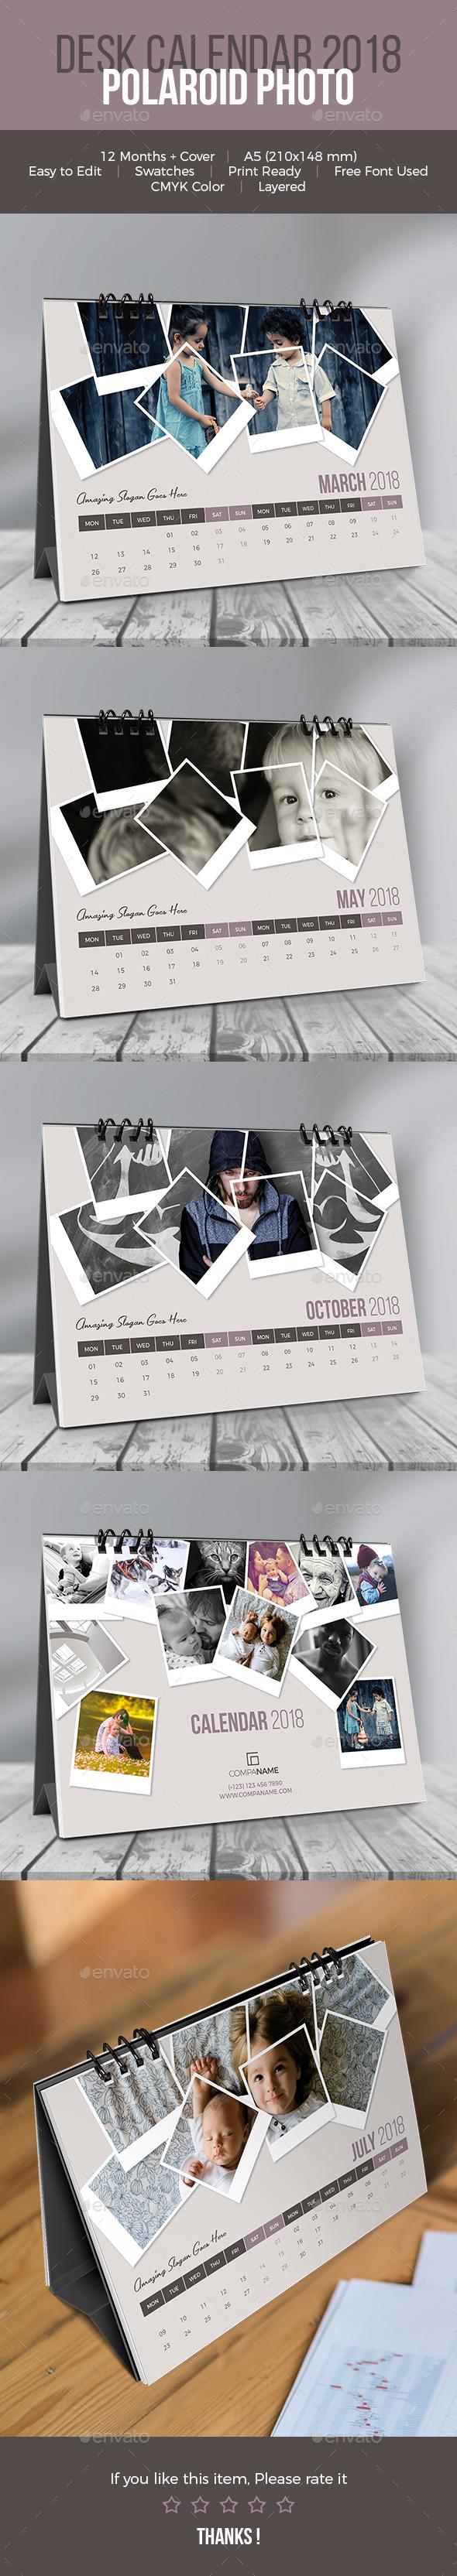 GraphicRiver Desk Calendar 2018 Polaroid Photo 21051164